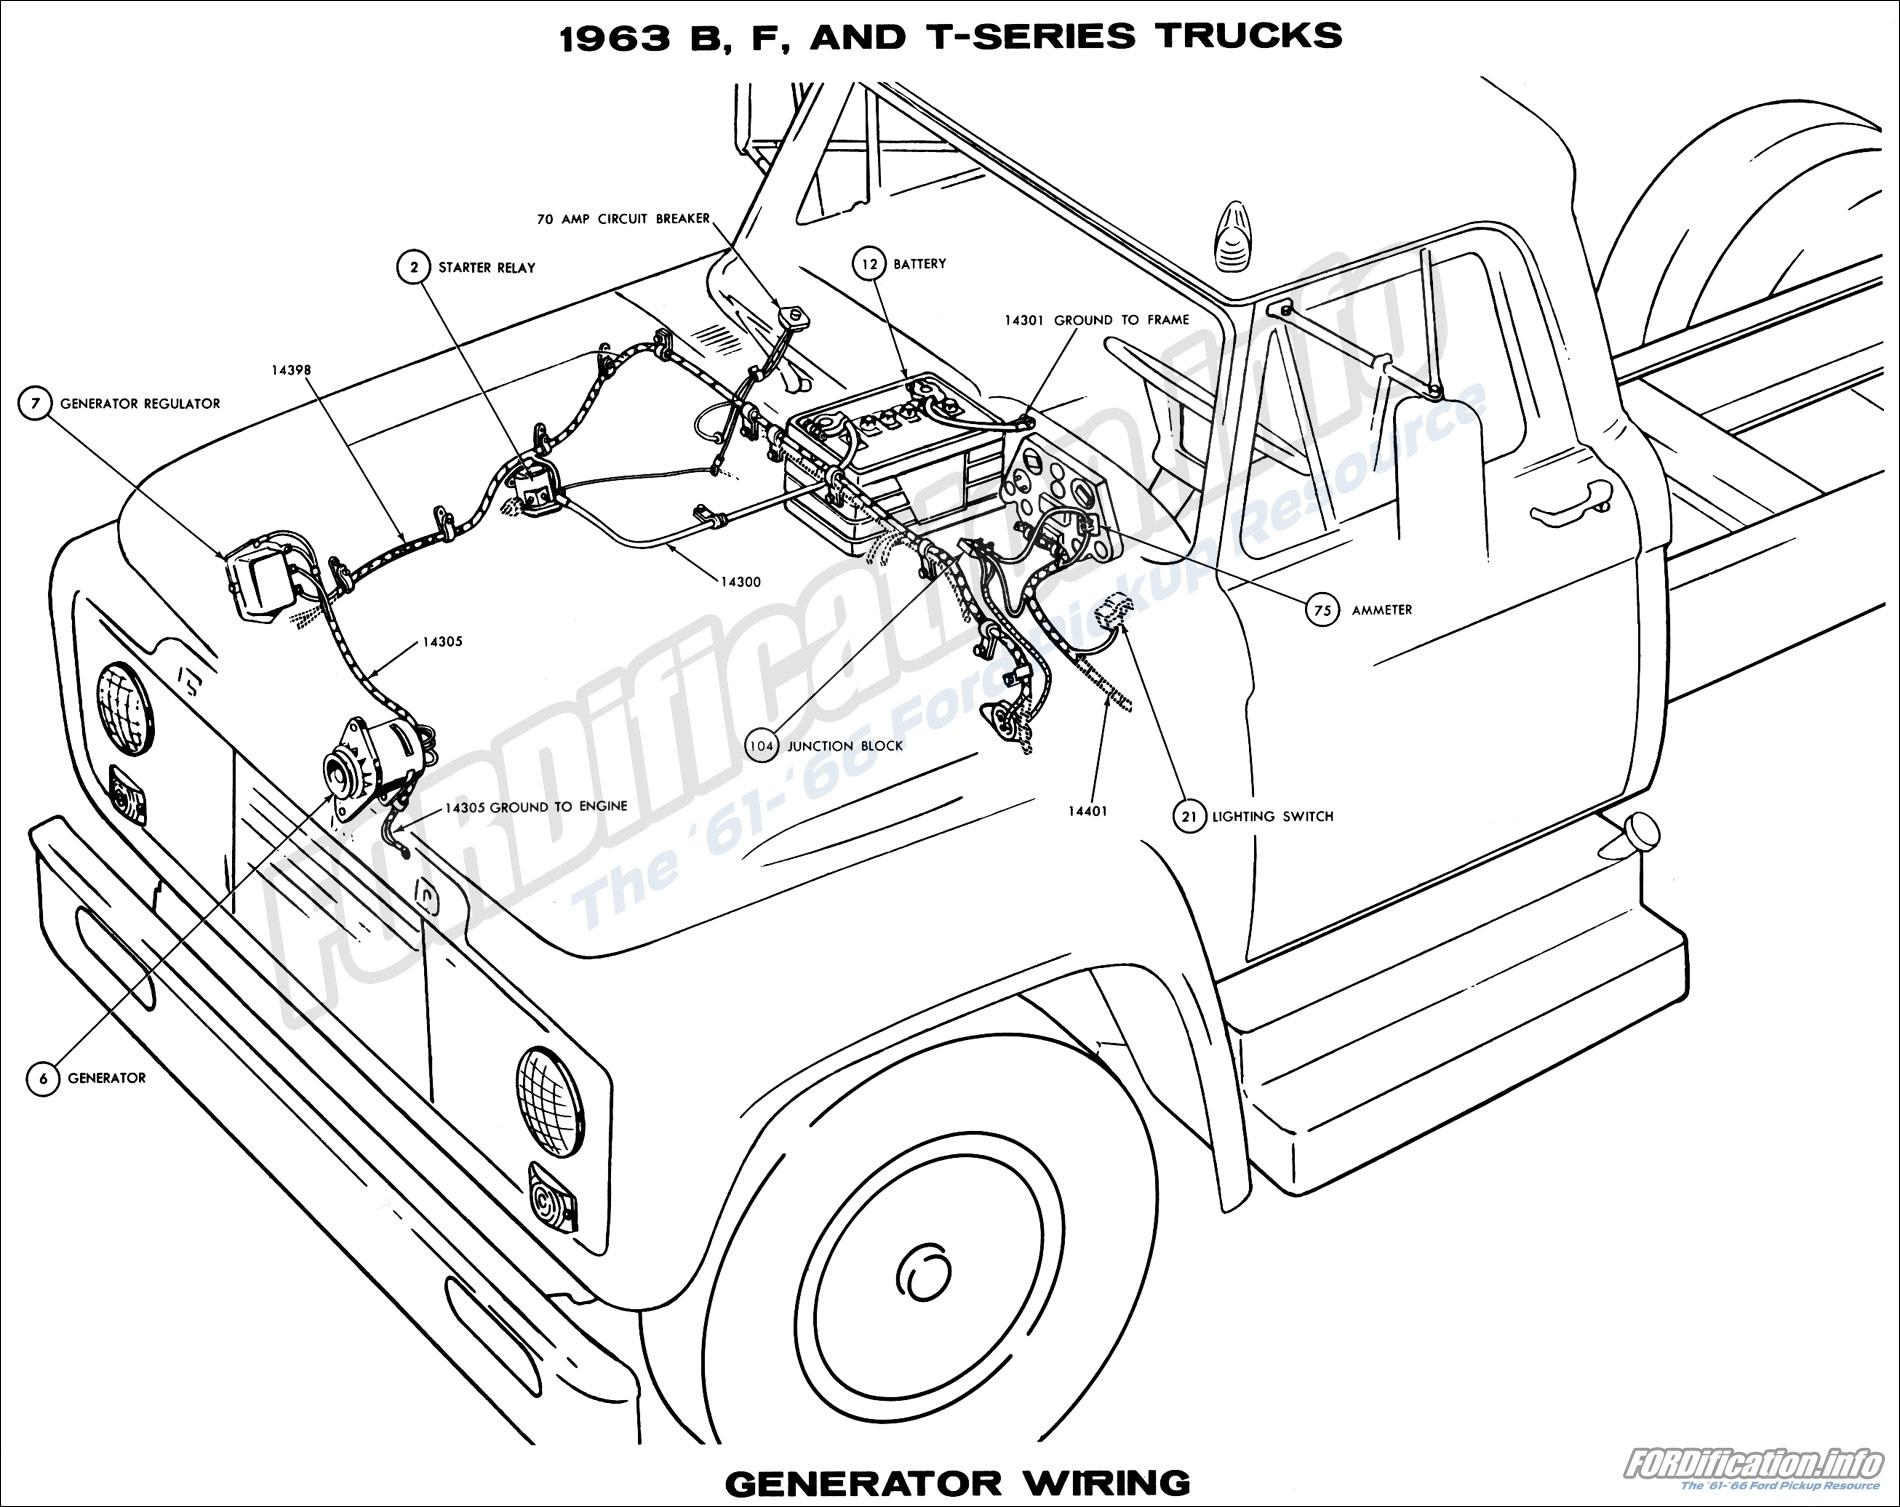 hight resolution of 1963 b f and t series trucks generator wiring